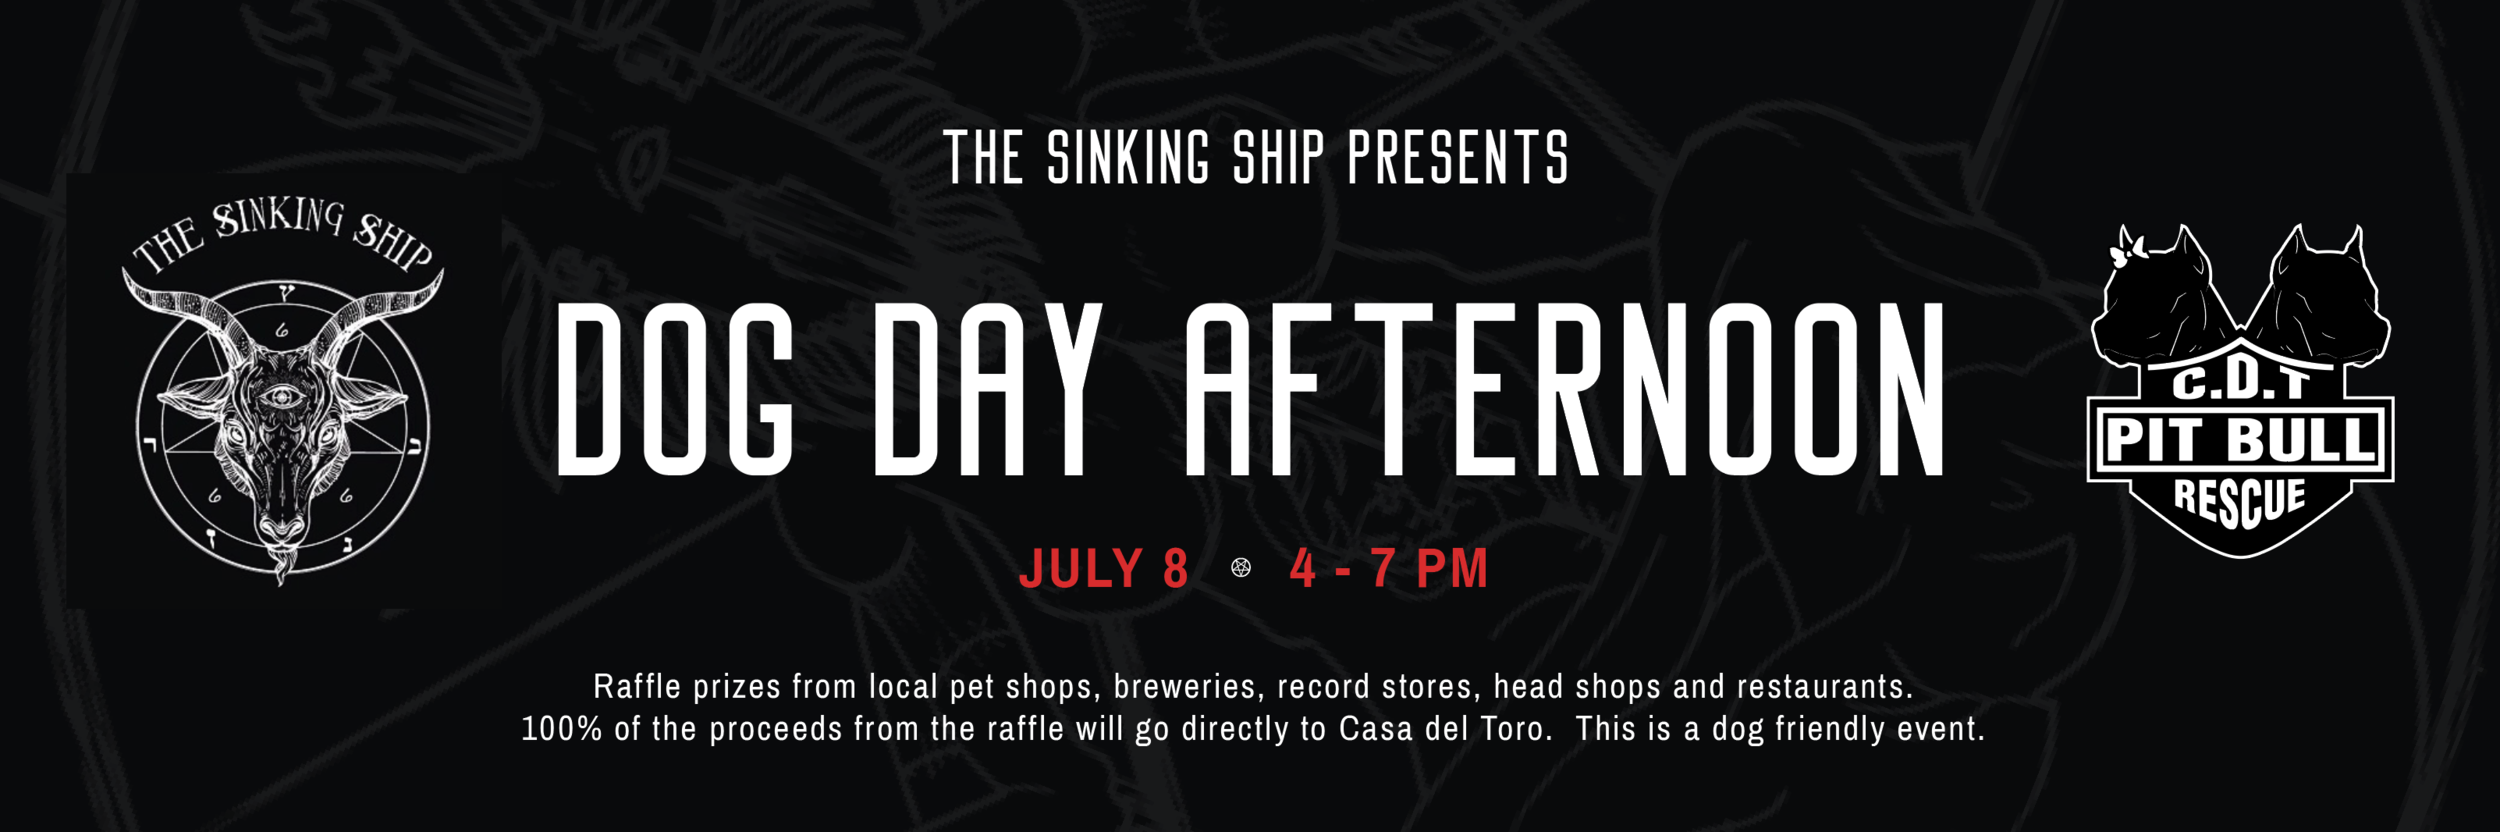 sinking ship web banner.png